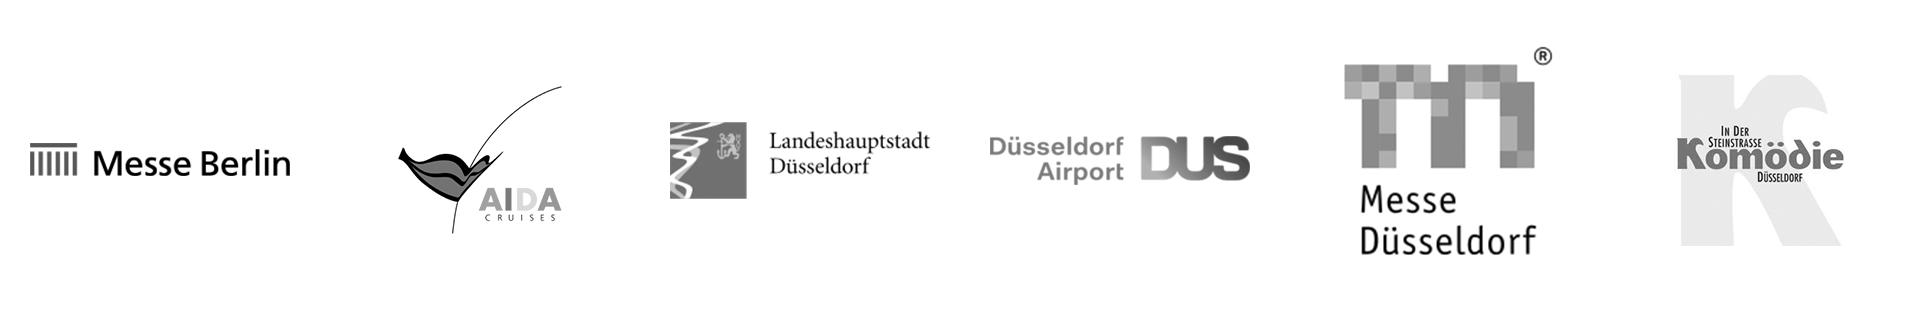 Messe Berlin, AIDA, Düsseldorf, Düsseldorf Airport, Messe Düsseldorf, Komödie Steinstraße